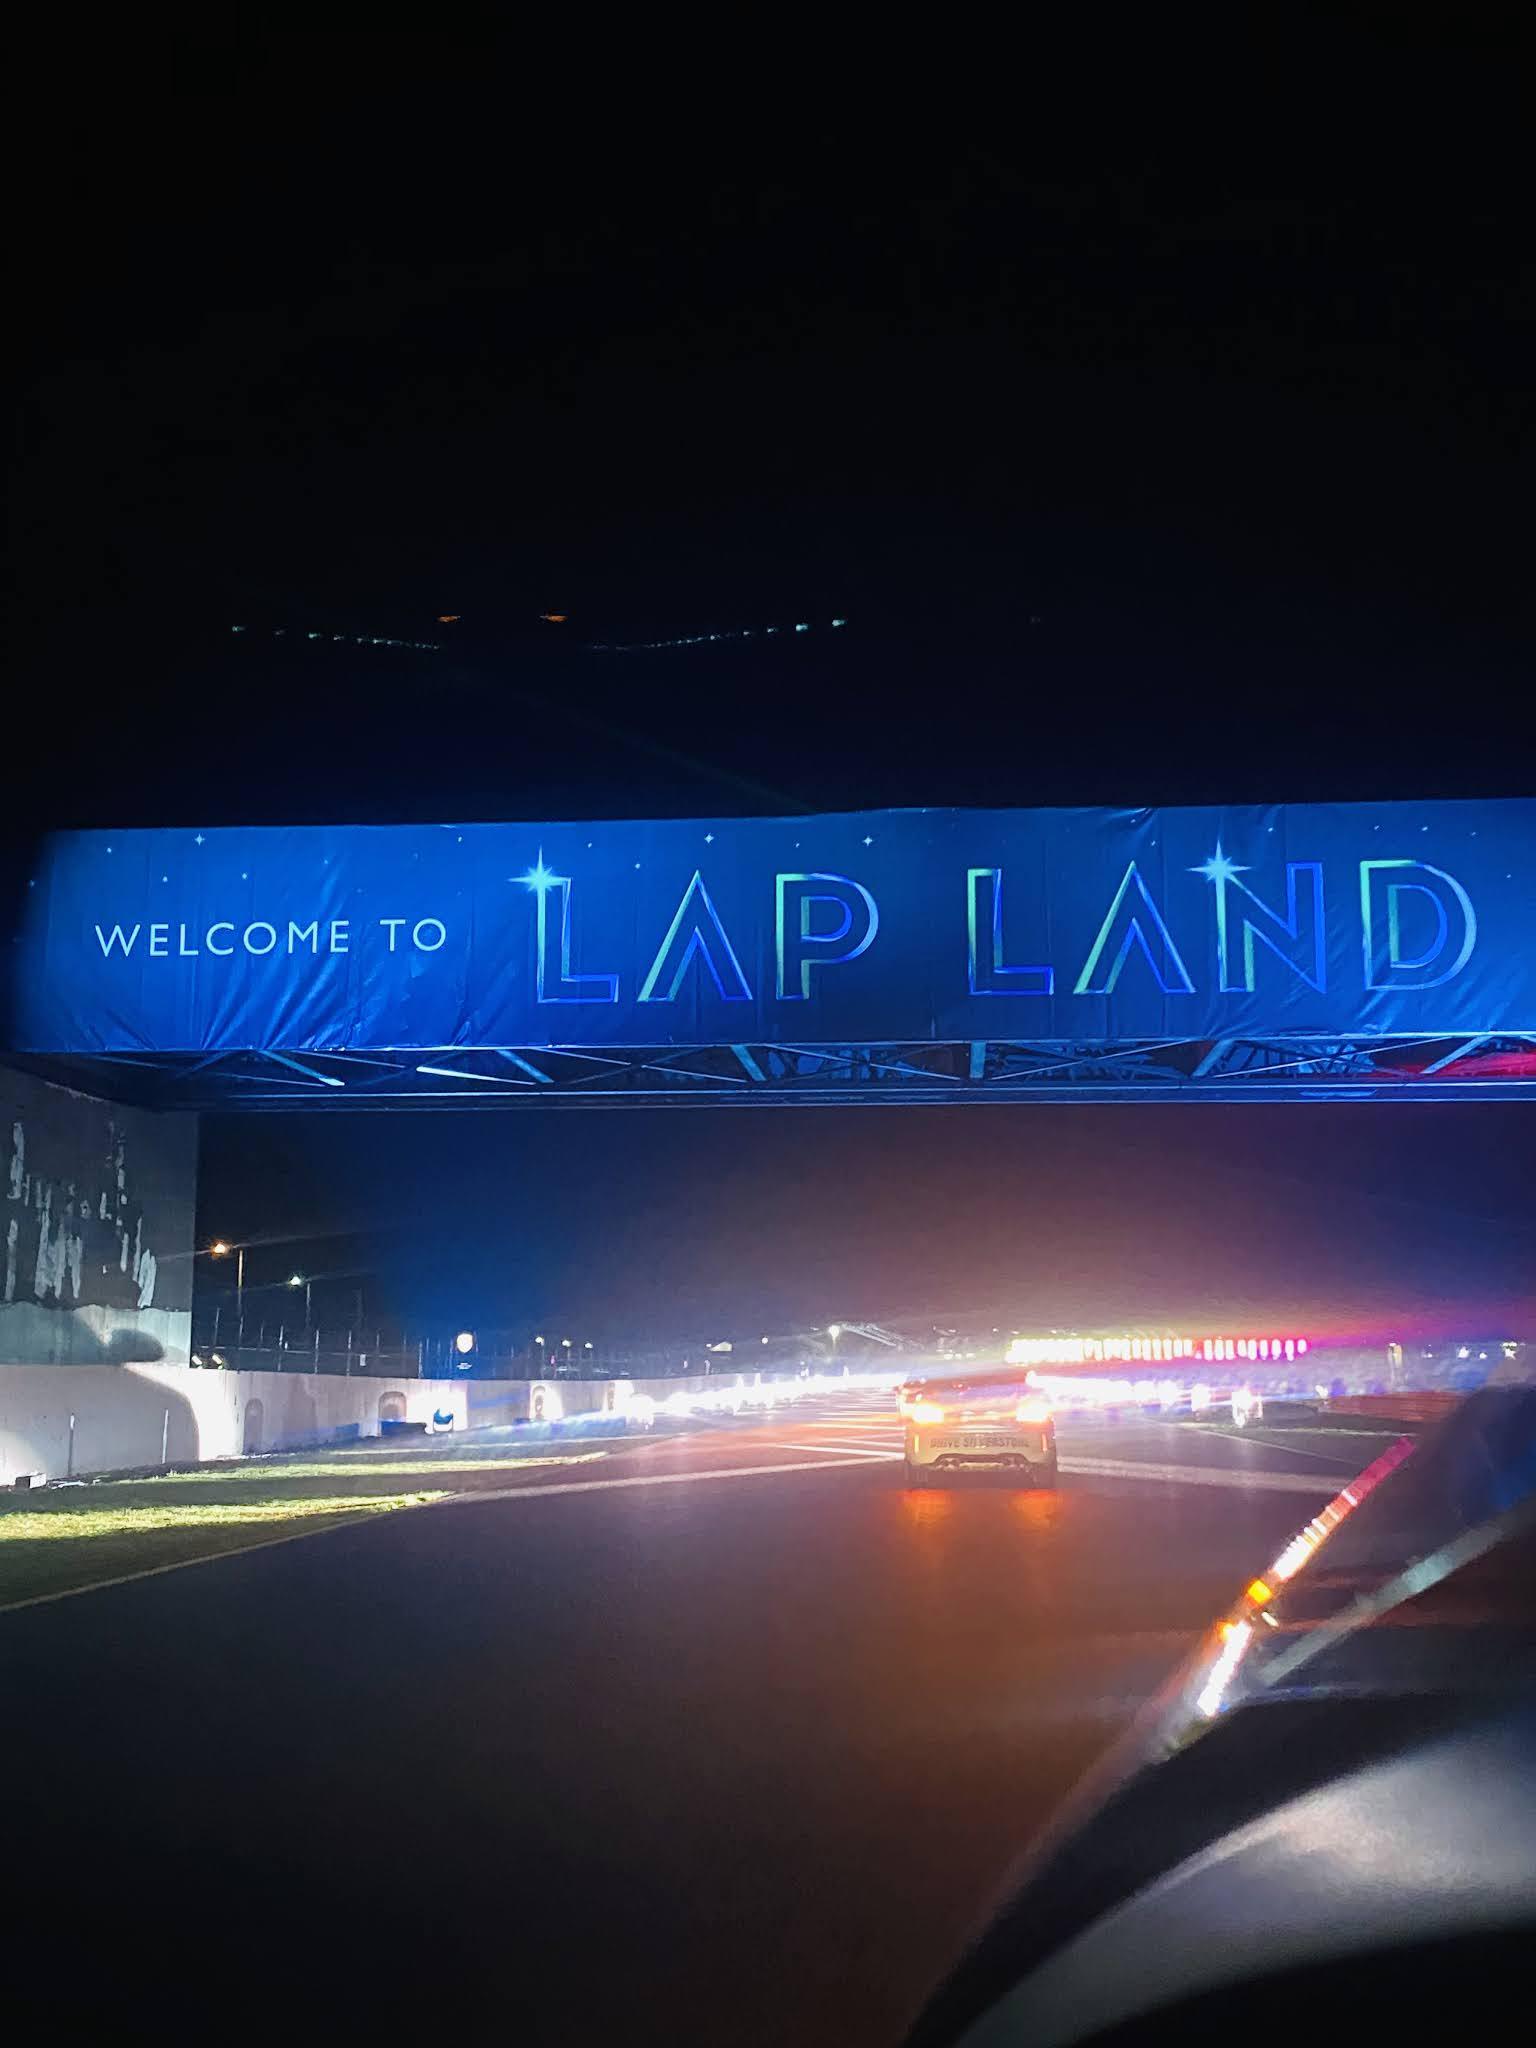 Lap Land Silverstone Review Entrance Banner